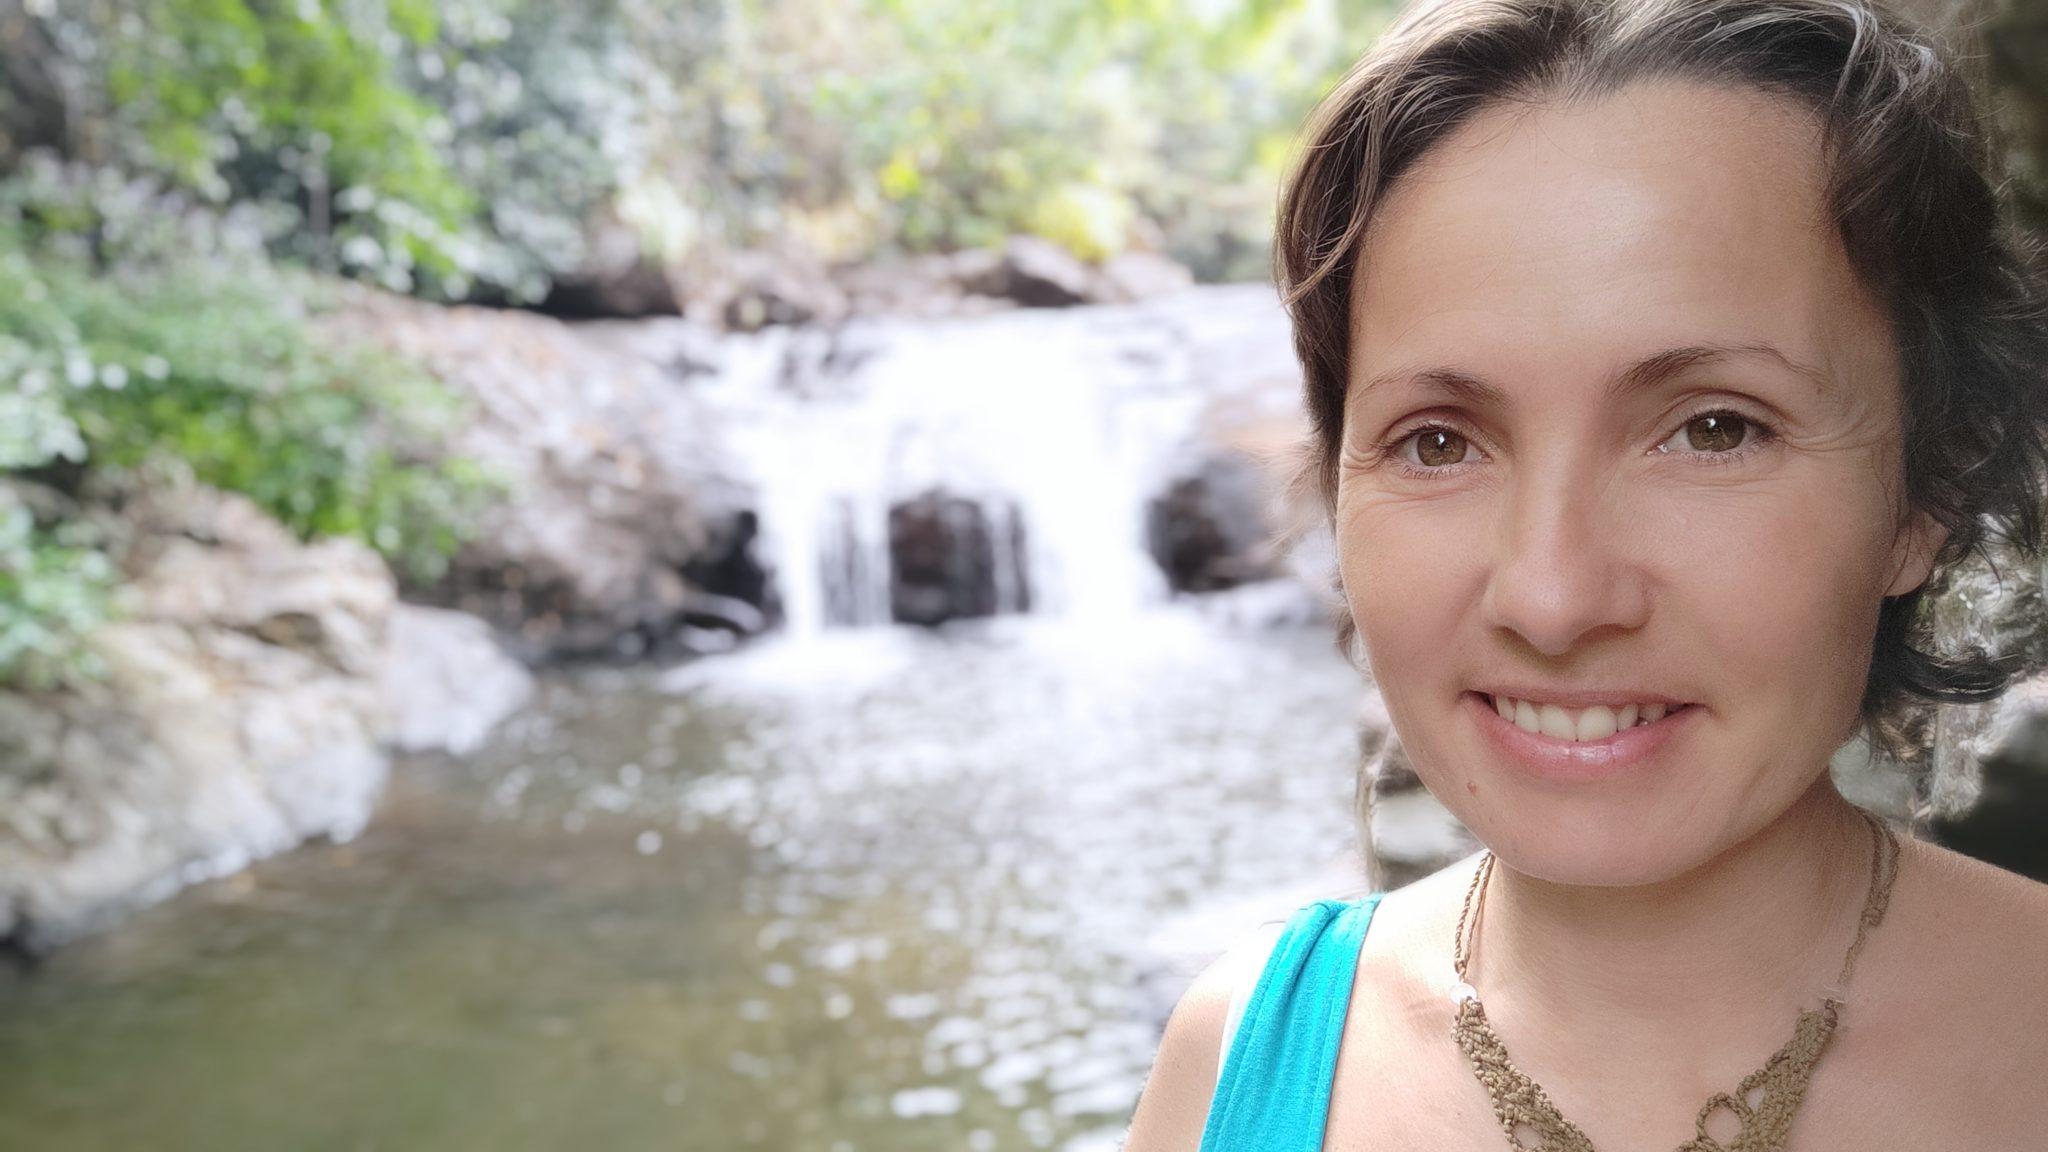 Diana Árbol - Podcast Mi viaje hacia el Ikigai